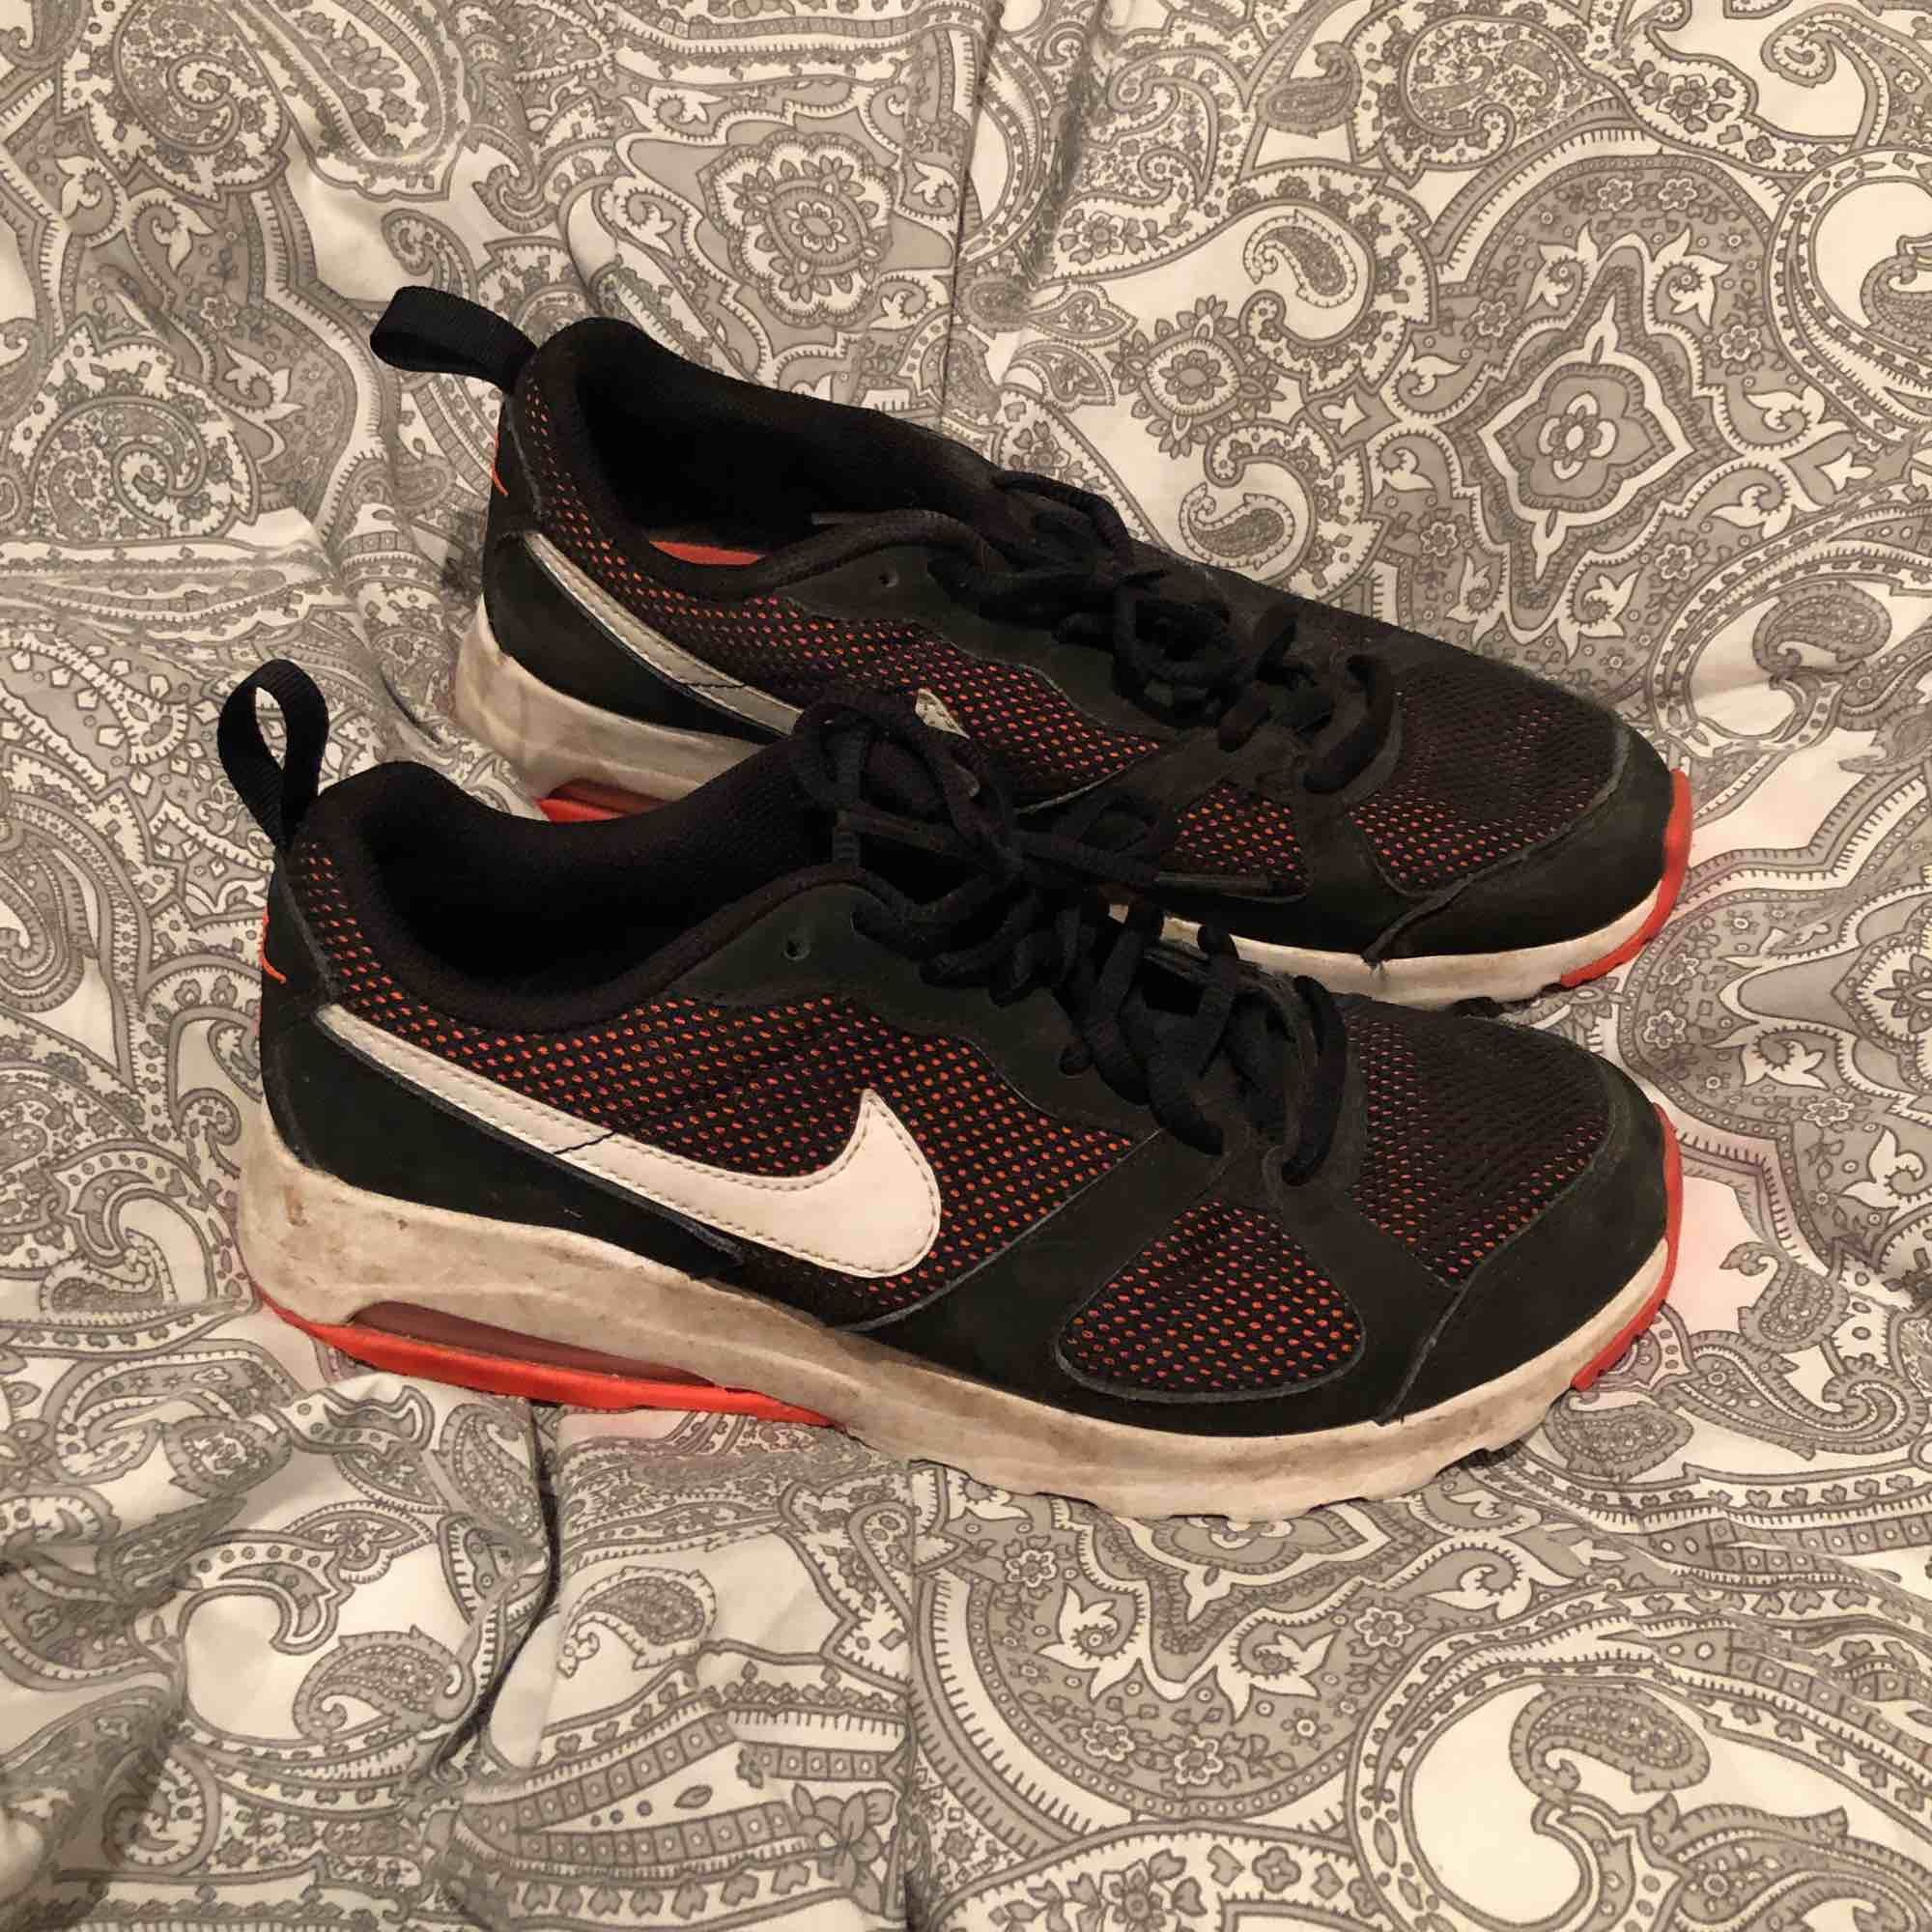 Svarta Nike gympaskor med orange detaljer. Storlek 40. Skor.